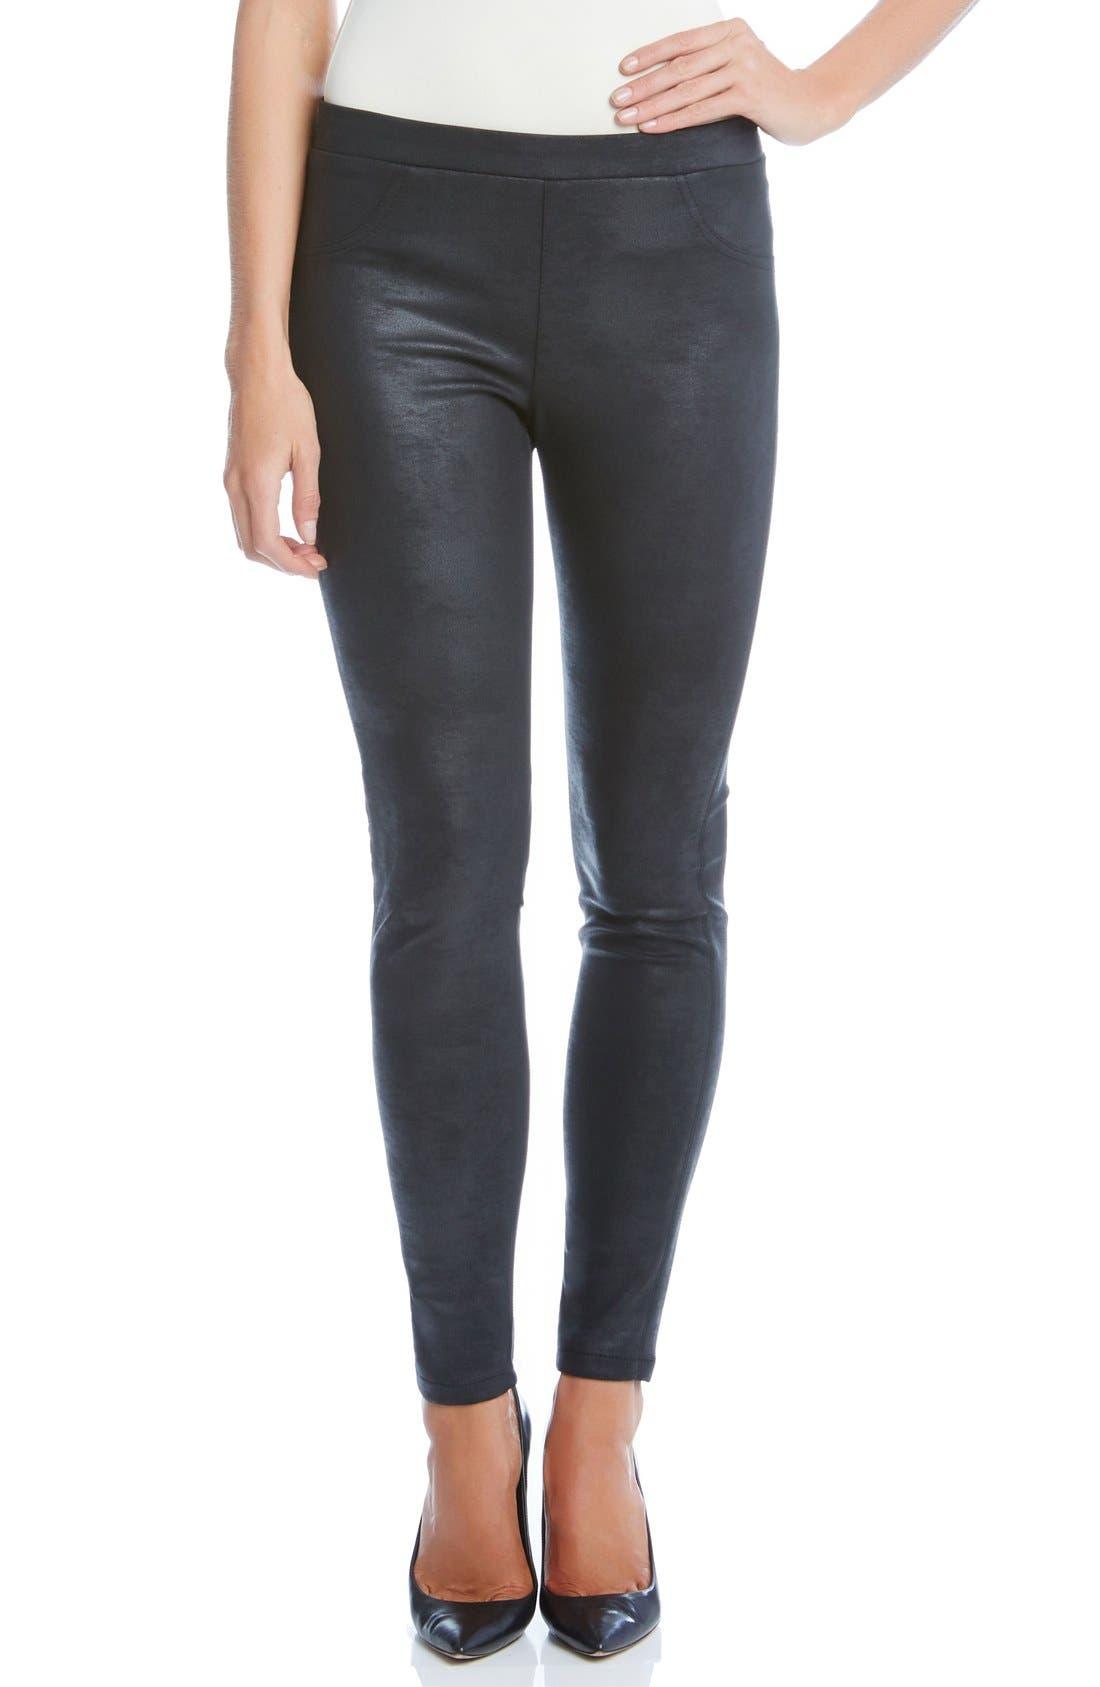 Alternate Image 1 Selected - Karen Kane Stretch Faux Leather Skinny Pants